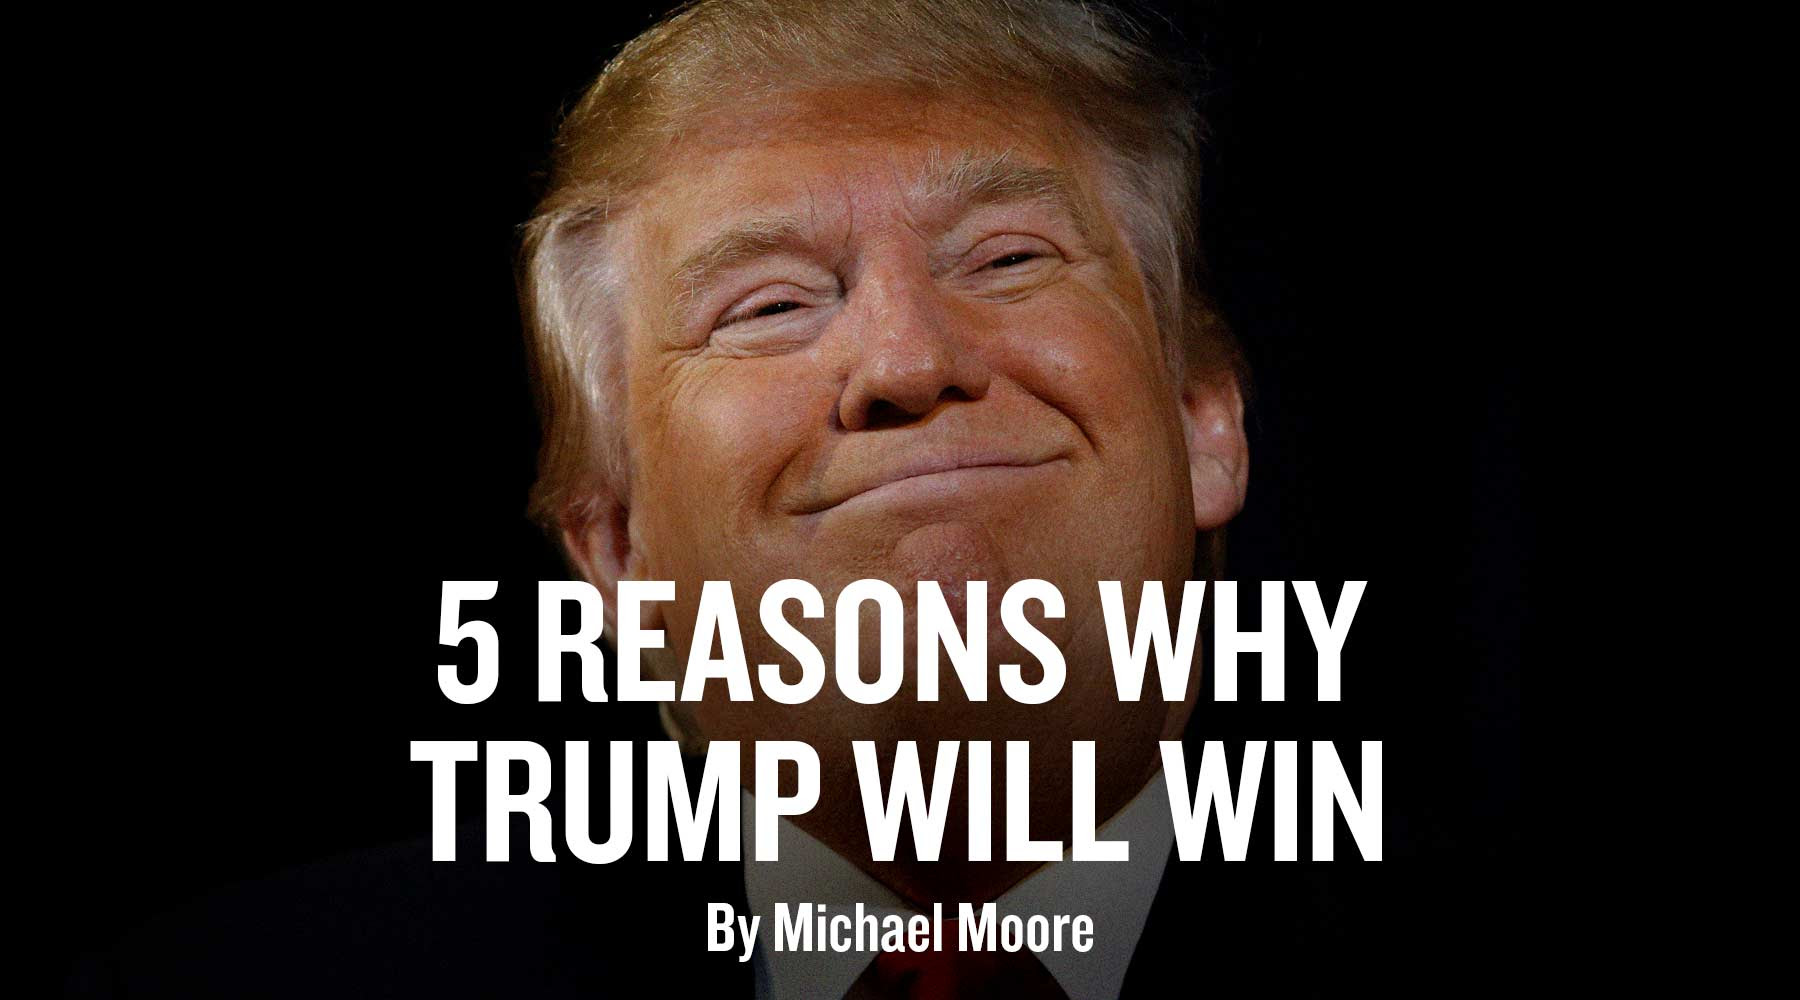 http://michaelmoore.s3.amazonaws.com/wp/uploads/2016/07/23143828/trumpwillwin.jpg